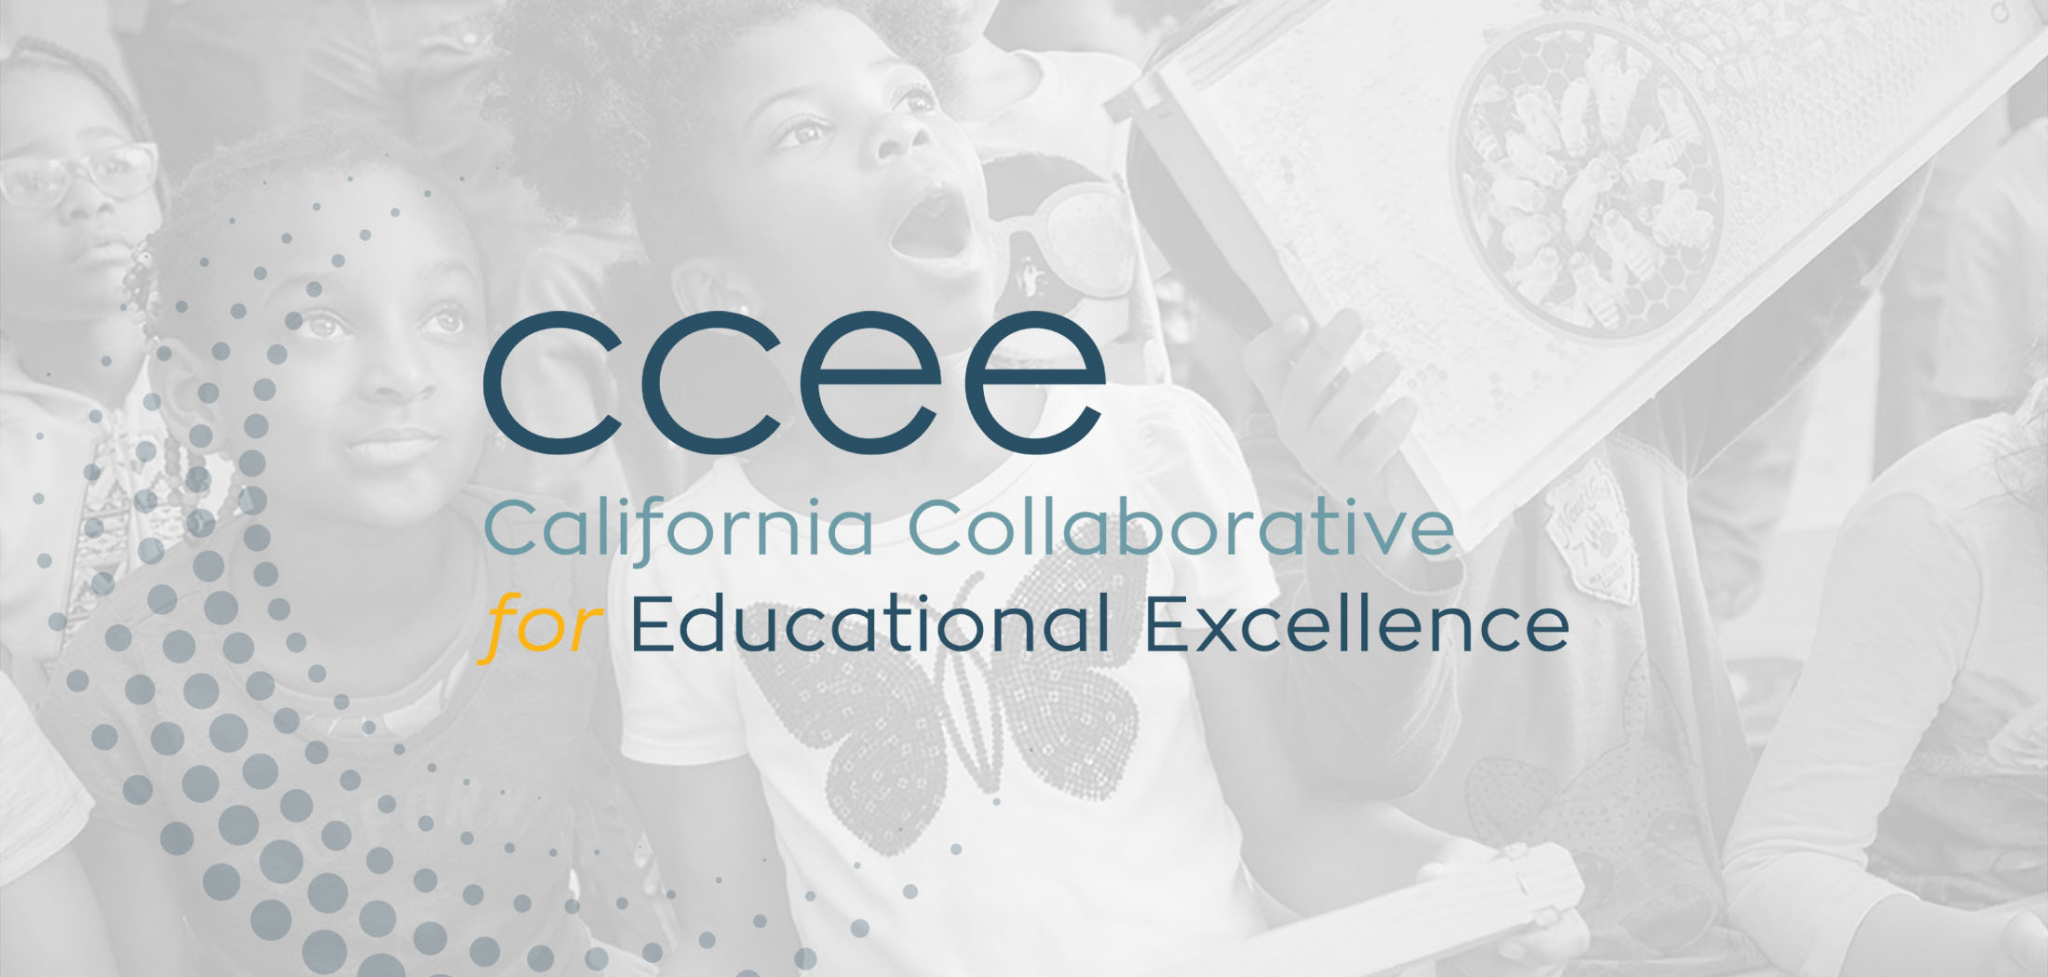 CCEE State Agency Rebranding Logo Design